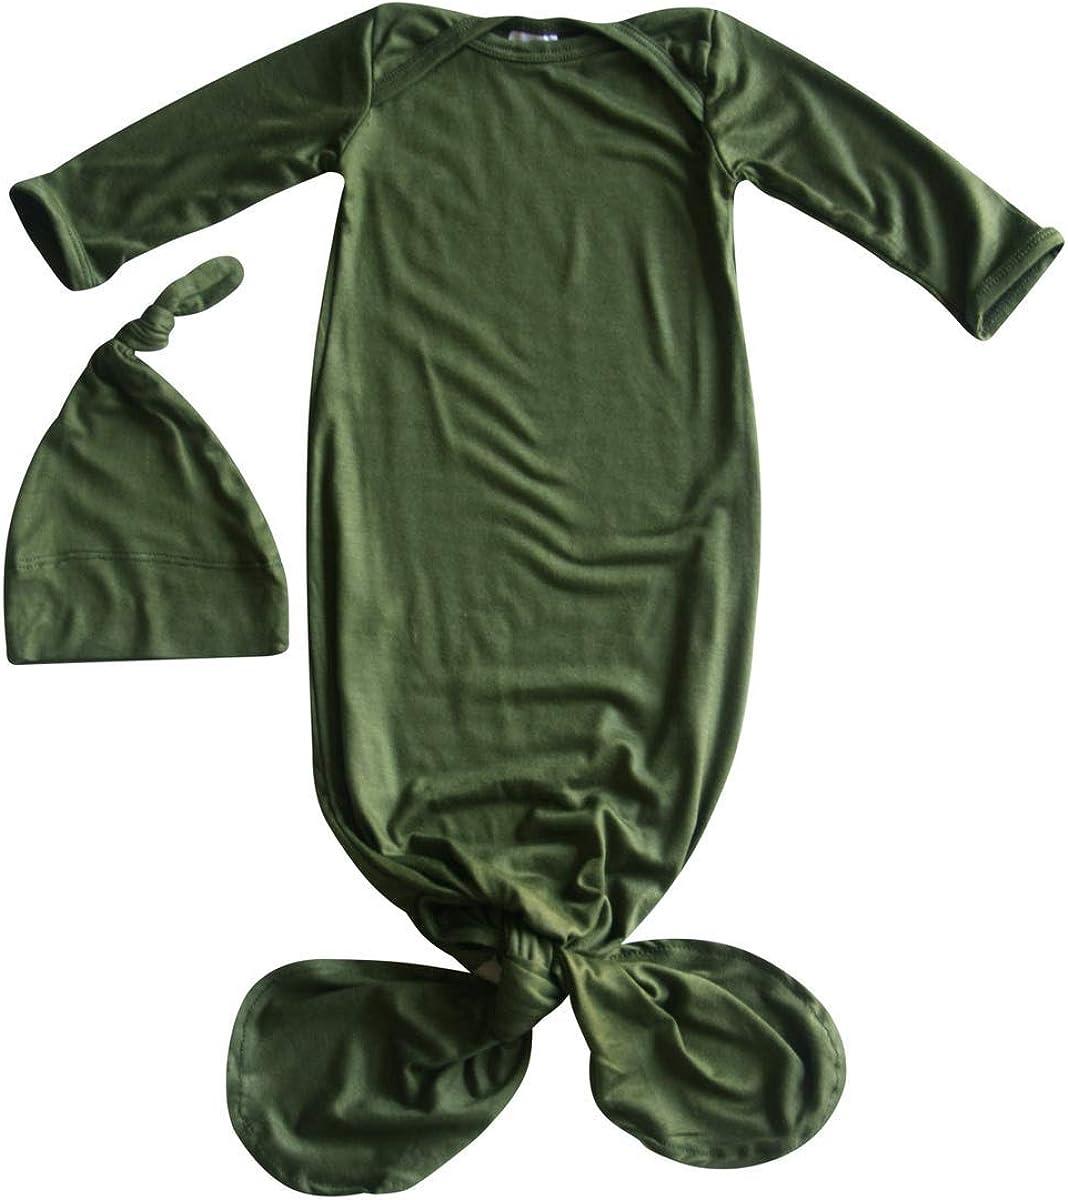 knot hat and no scratch mittens outdoor adventure Baby gown newborn set neutral